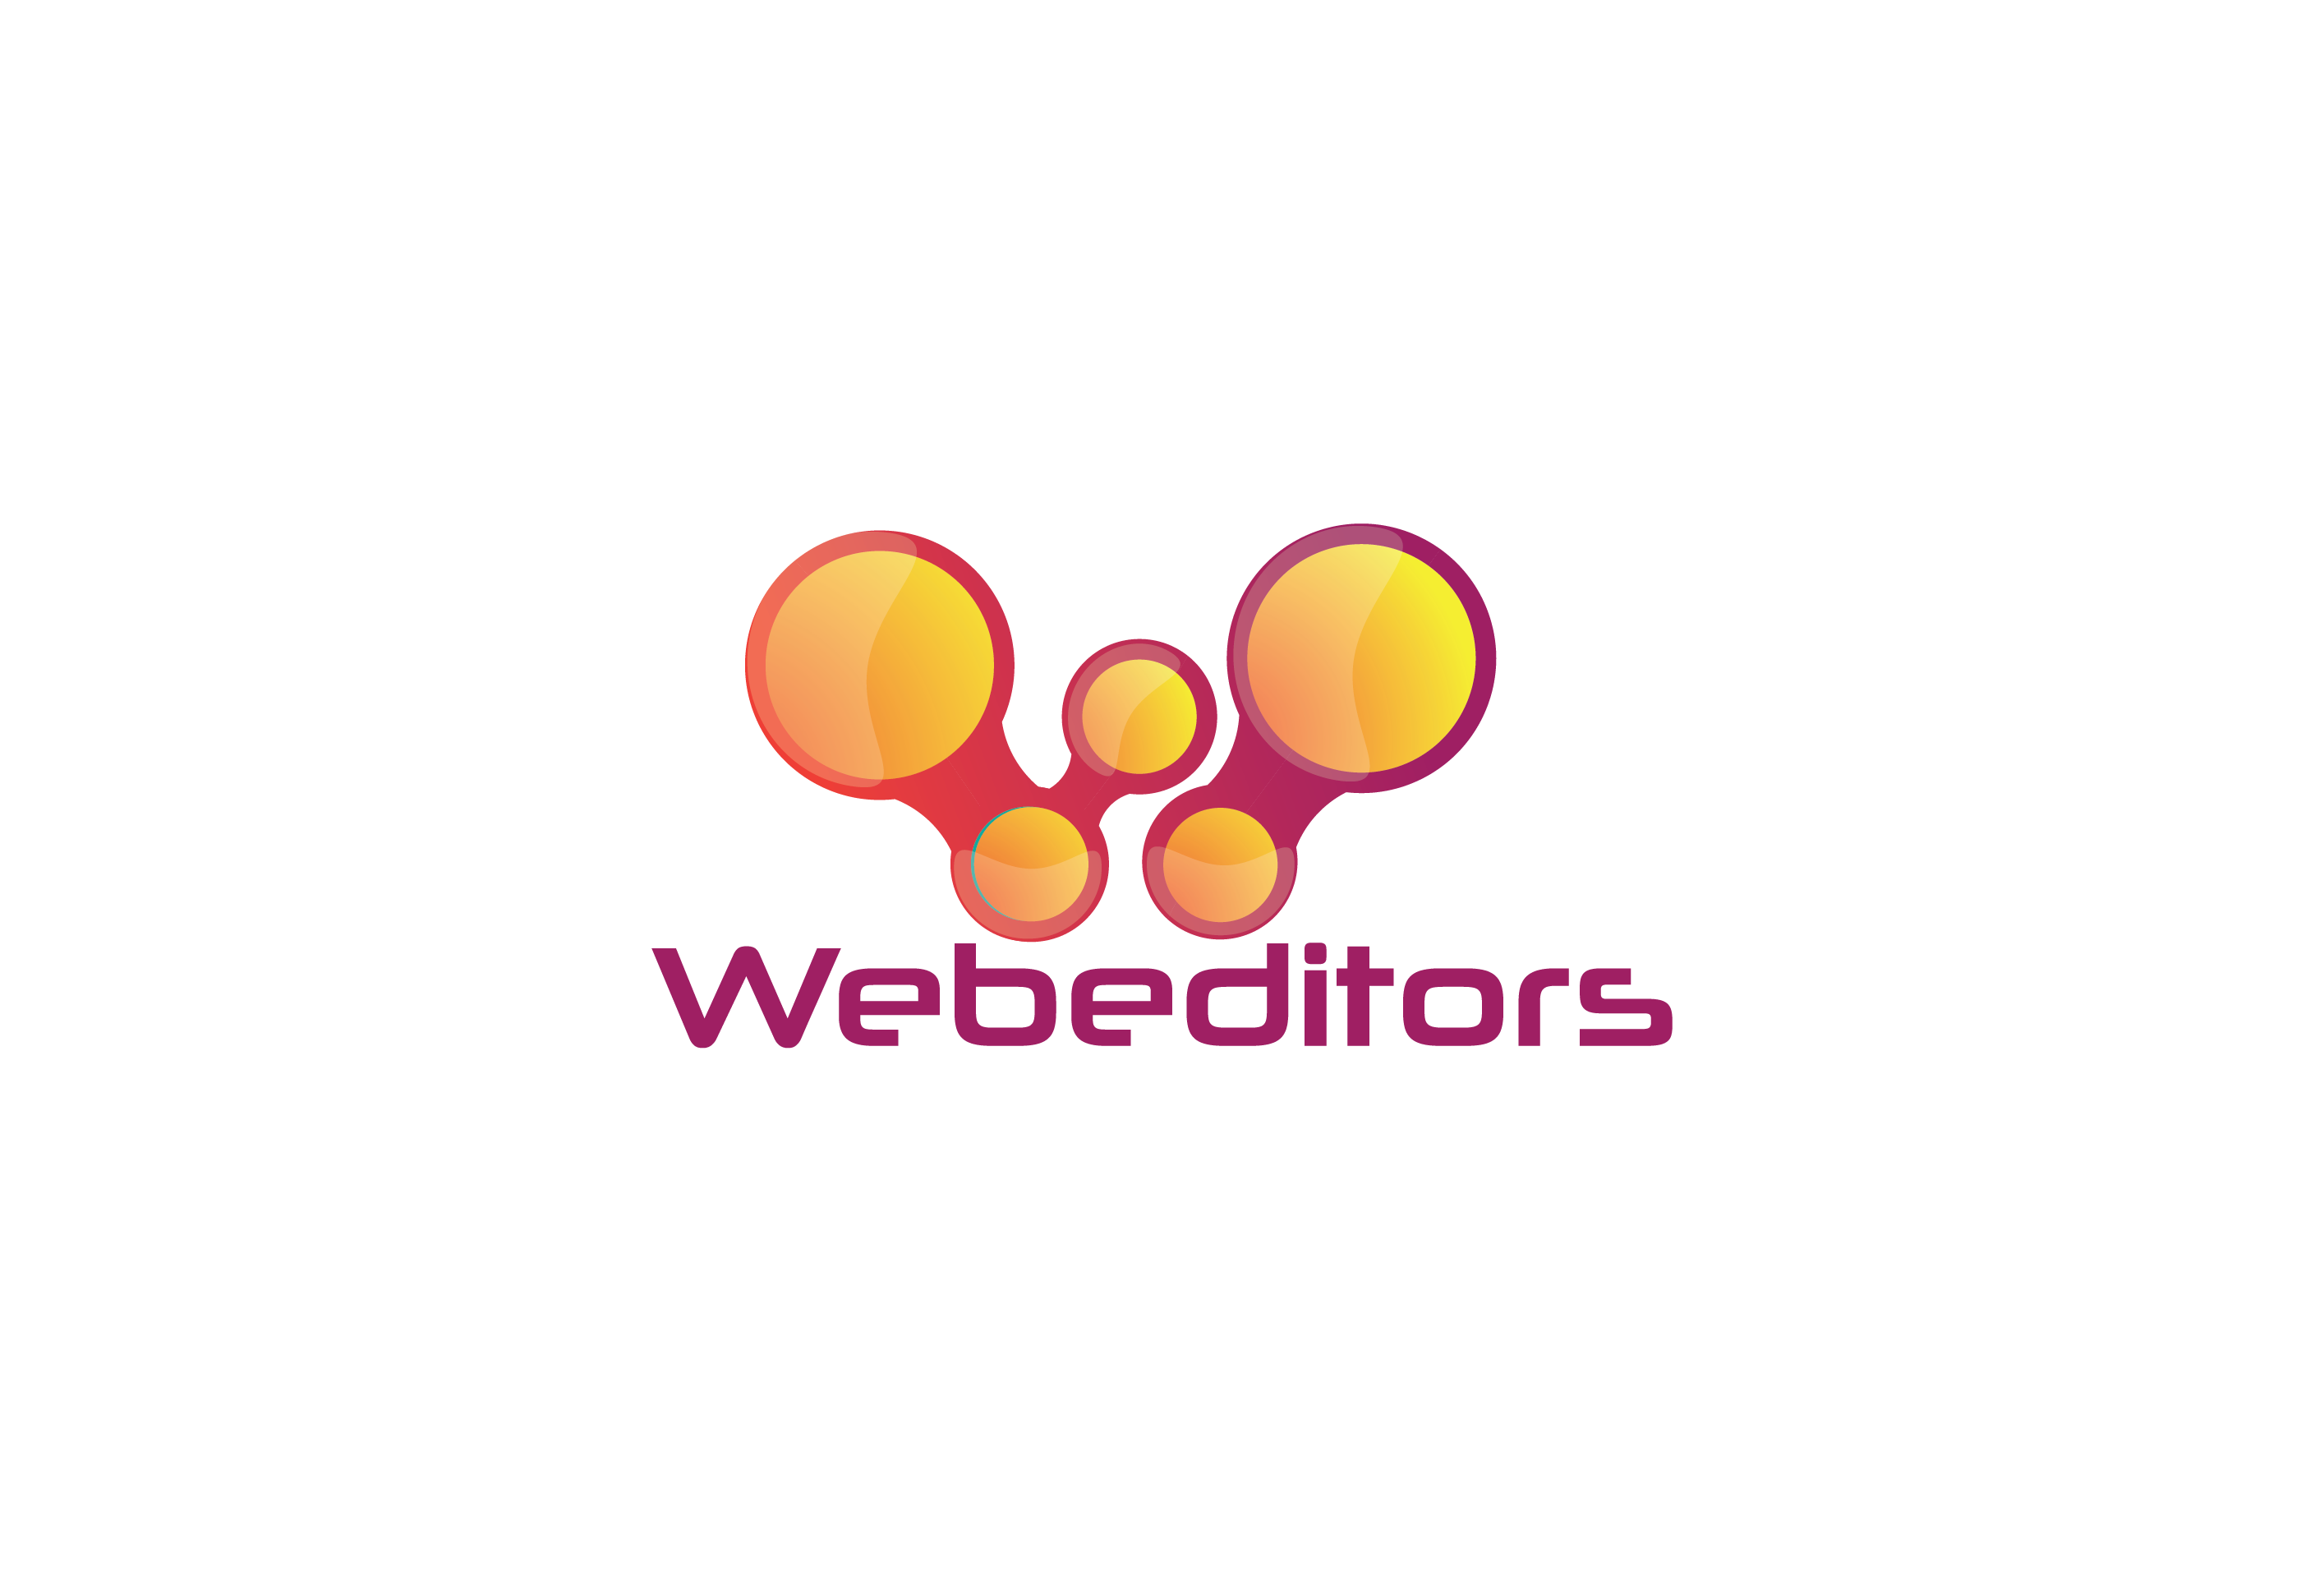 Webeditors